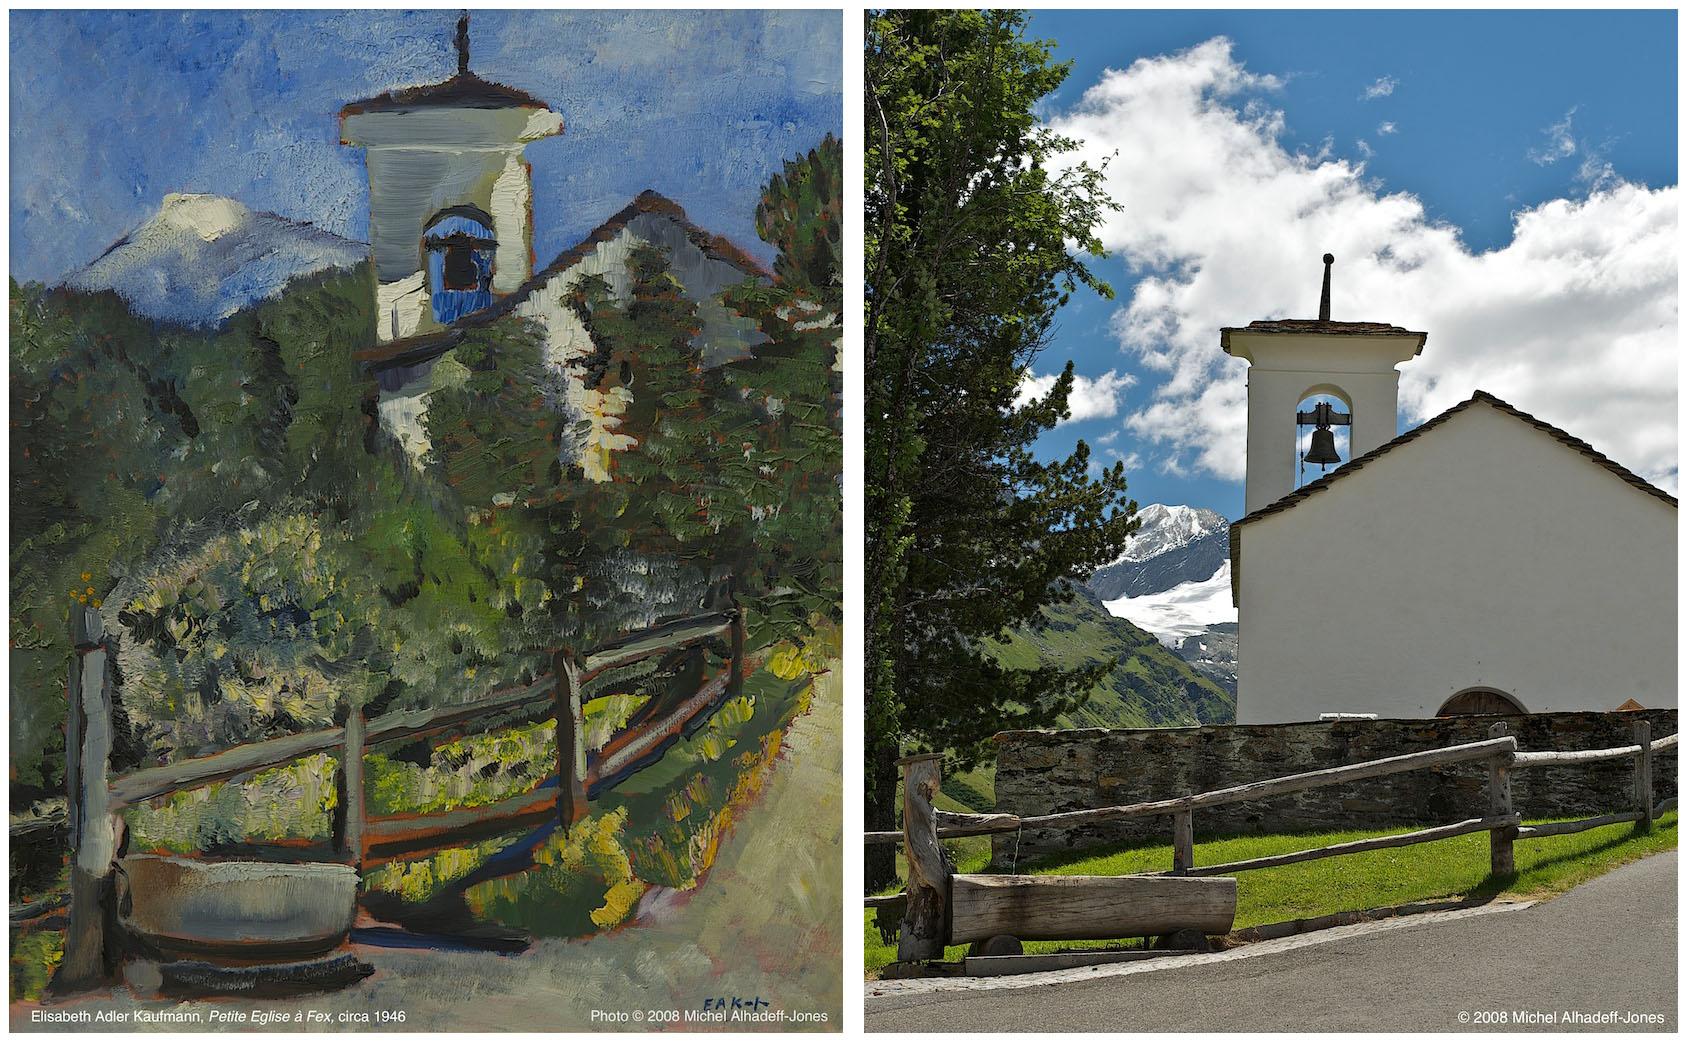 Eglise, Fex, circa 1946 / 2008